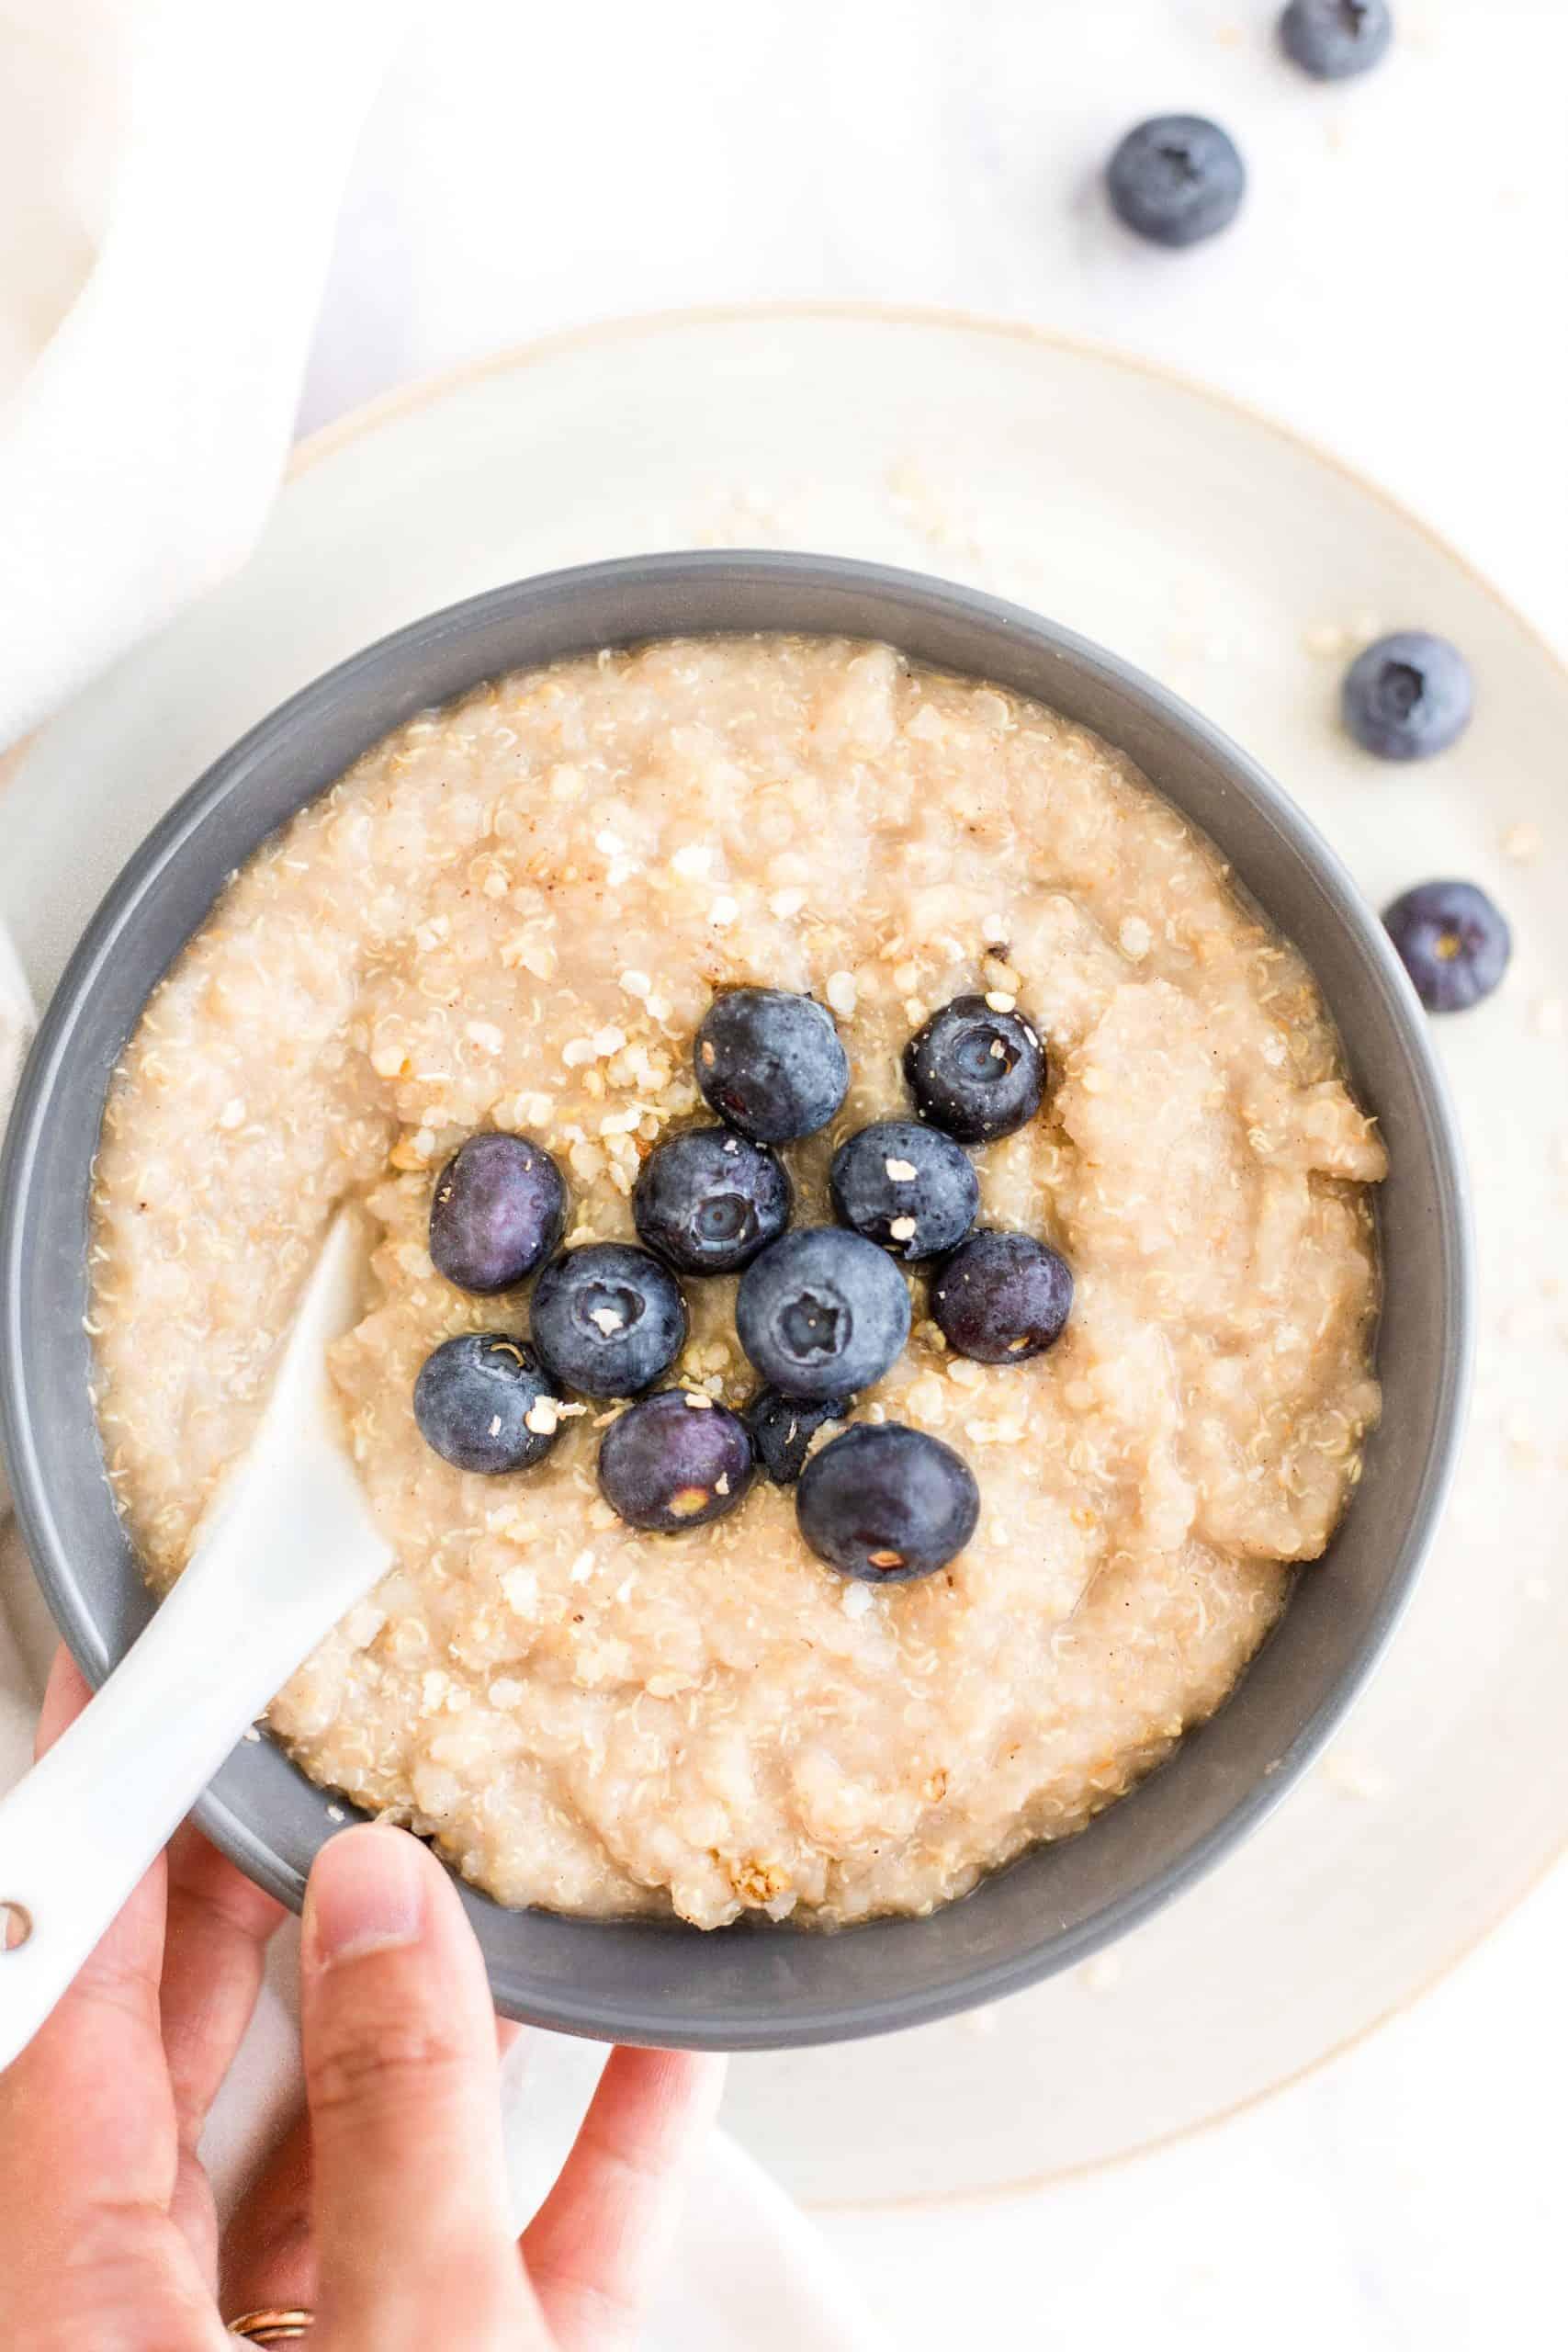 A bowl of creamy quinoa porridge with fresh blueberries.